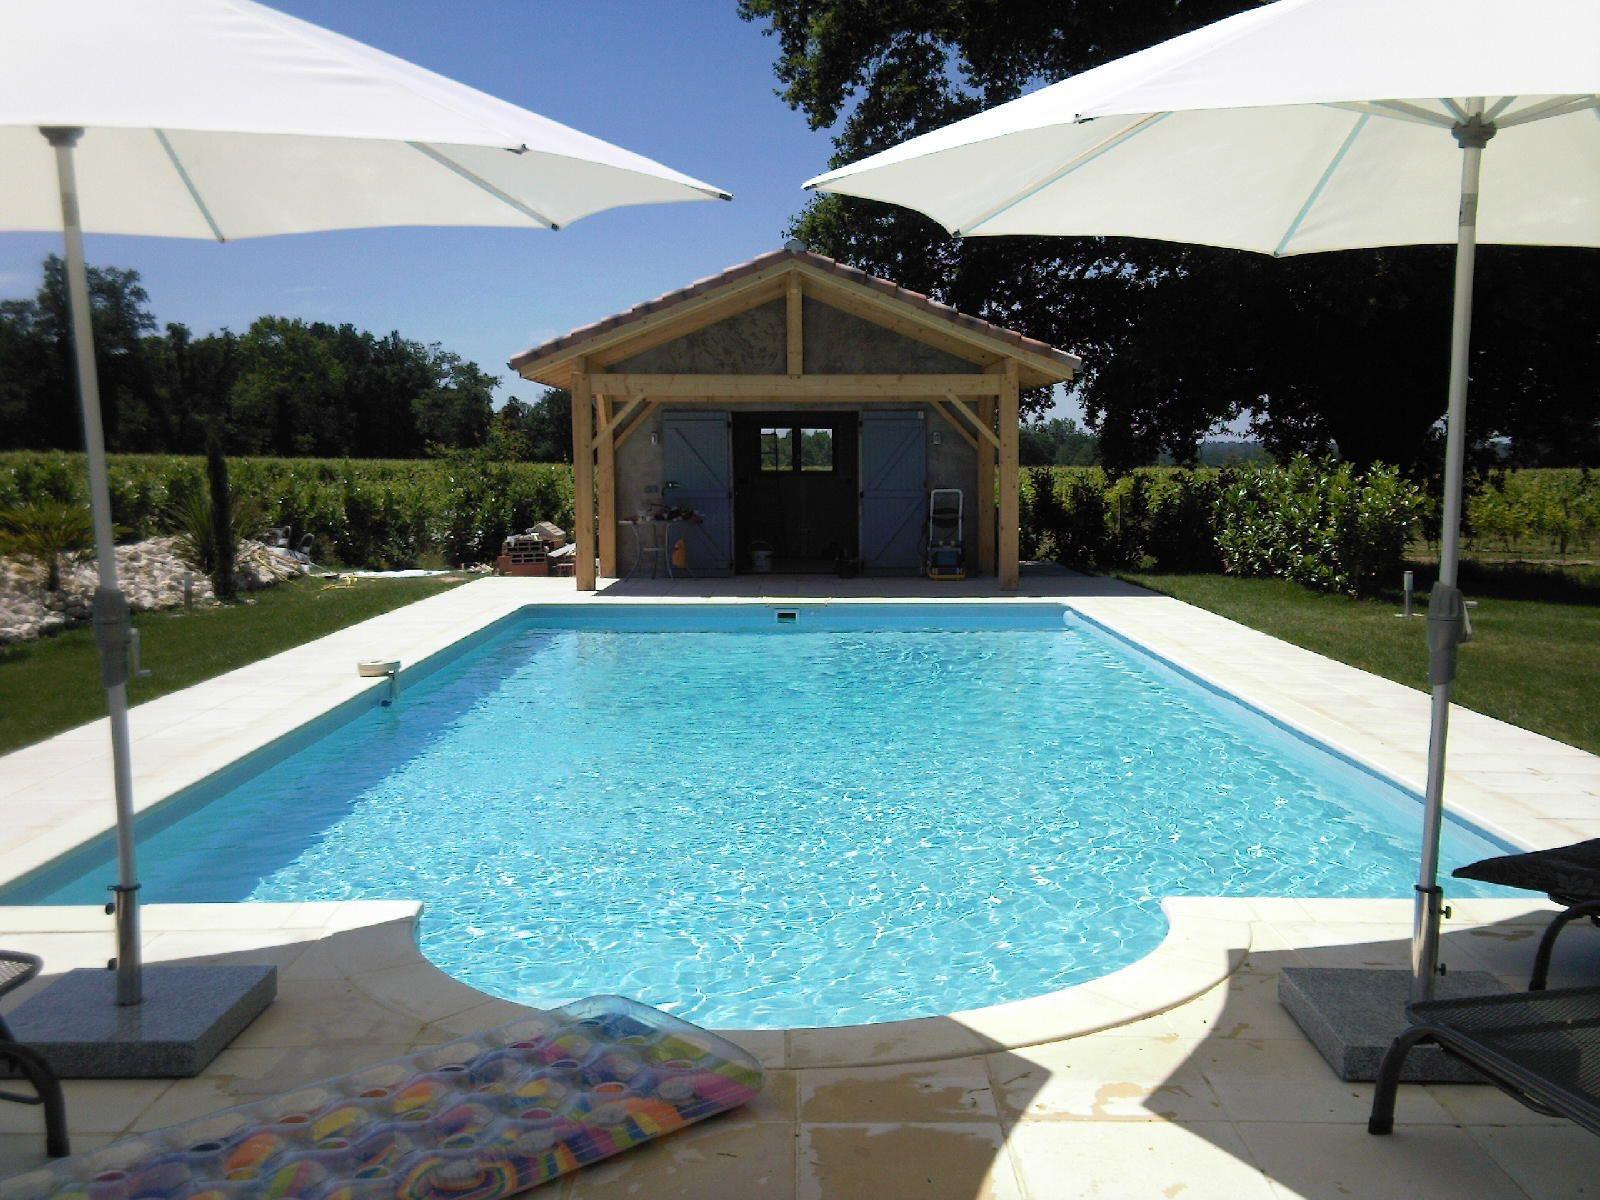 Vente gasconne entierement renovee et piscine for Piscine peyriac